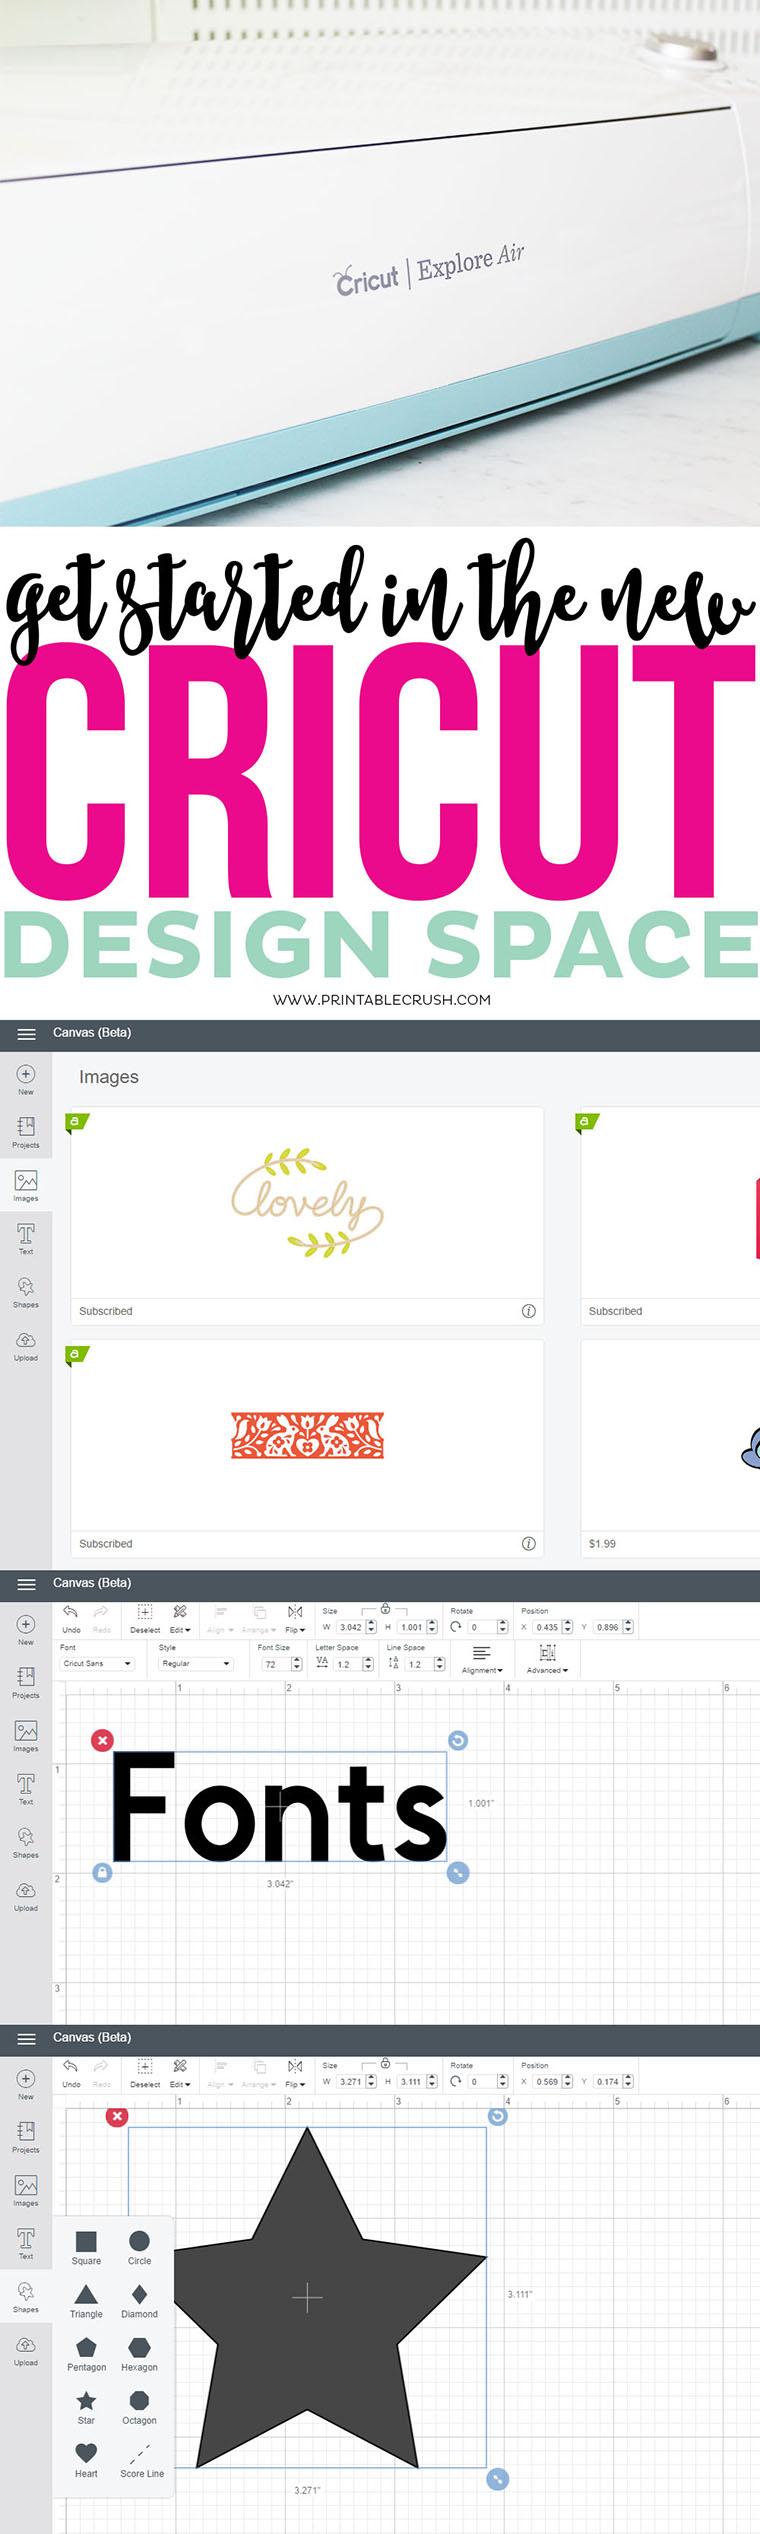 Cricut Design Space long pin collage